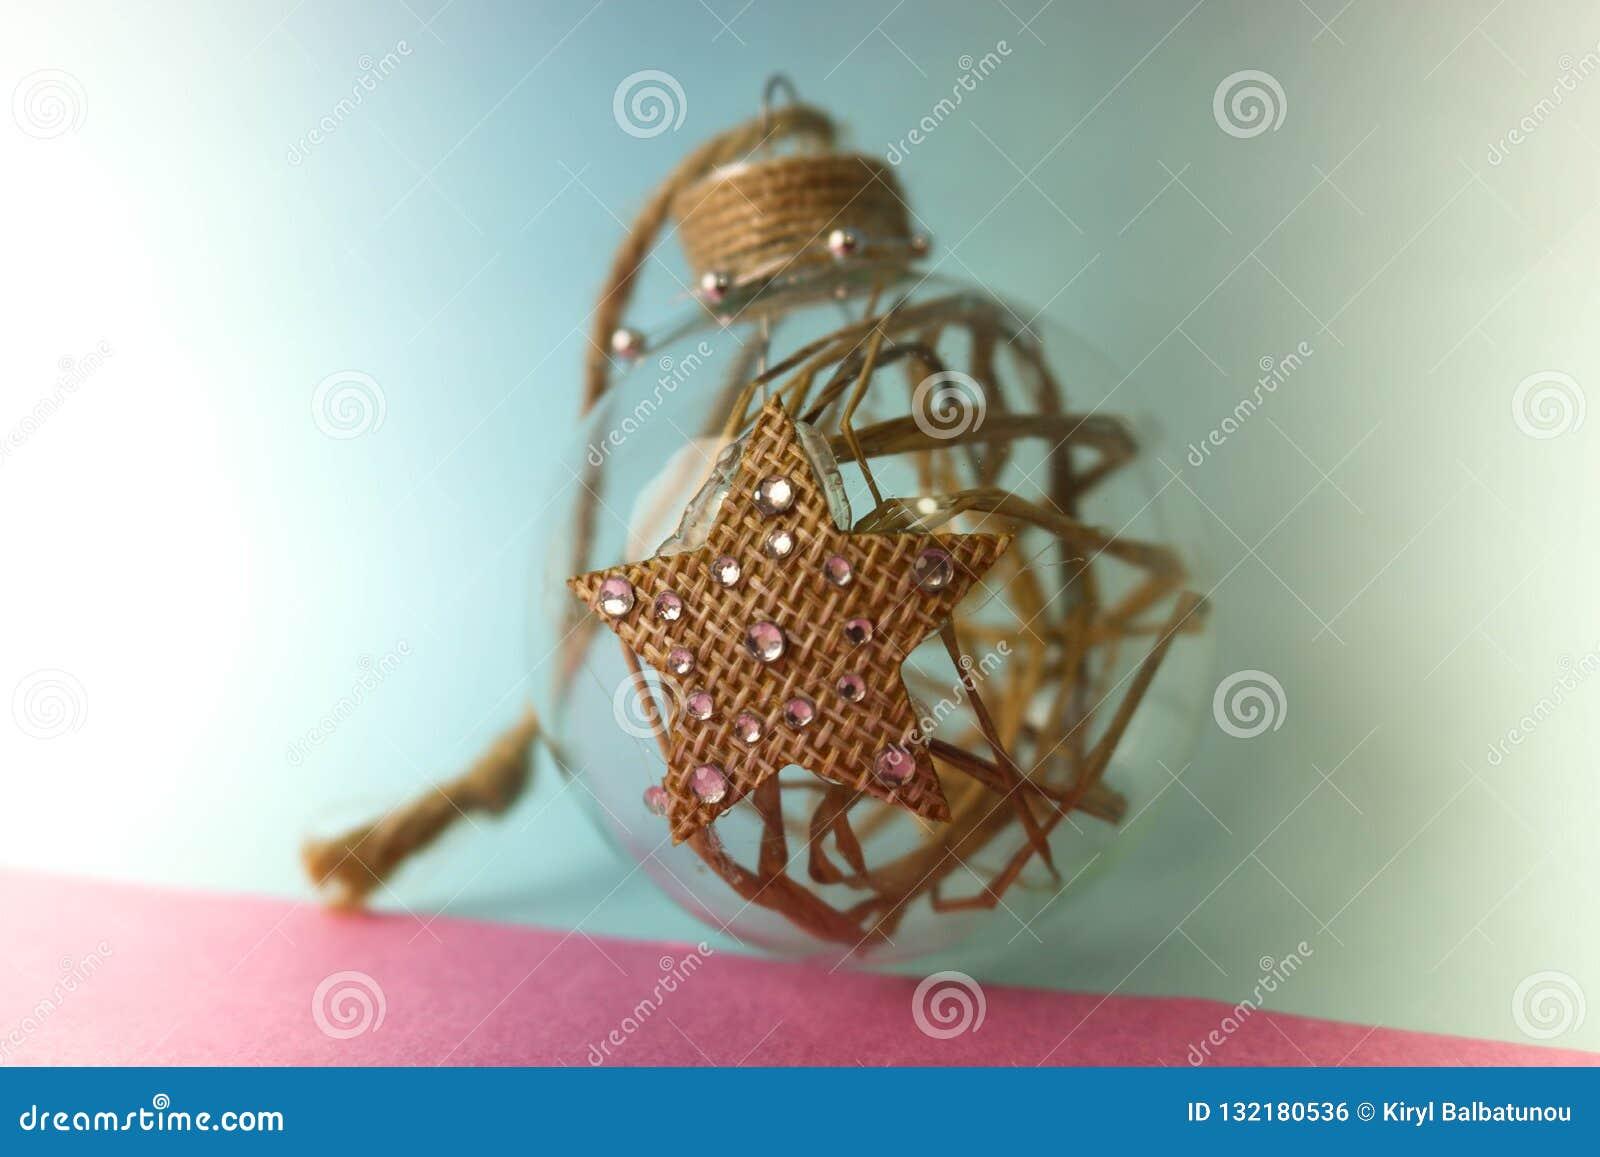 De kleine ronde bal van Kerstmis feestelijke Kerstmis van glas transparante uitstekende eigengemaakte slimme hipster decoratieve,